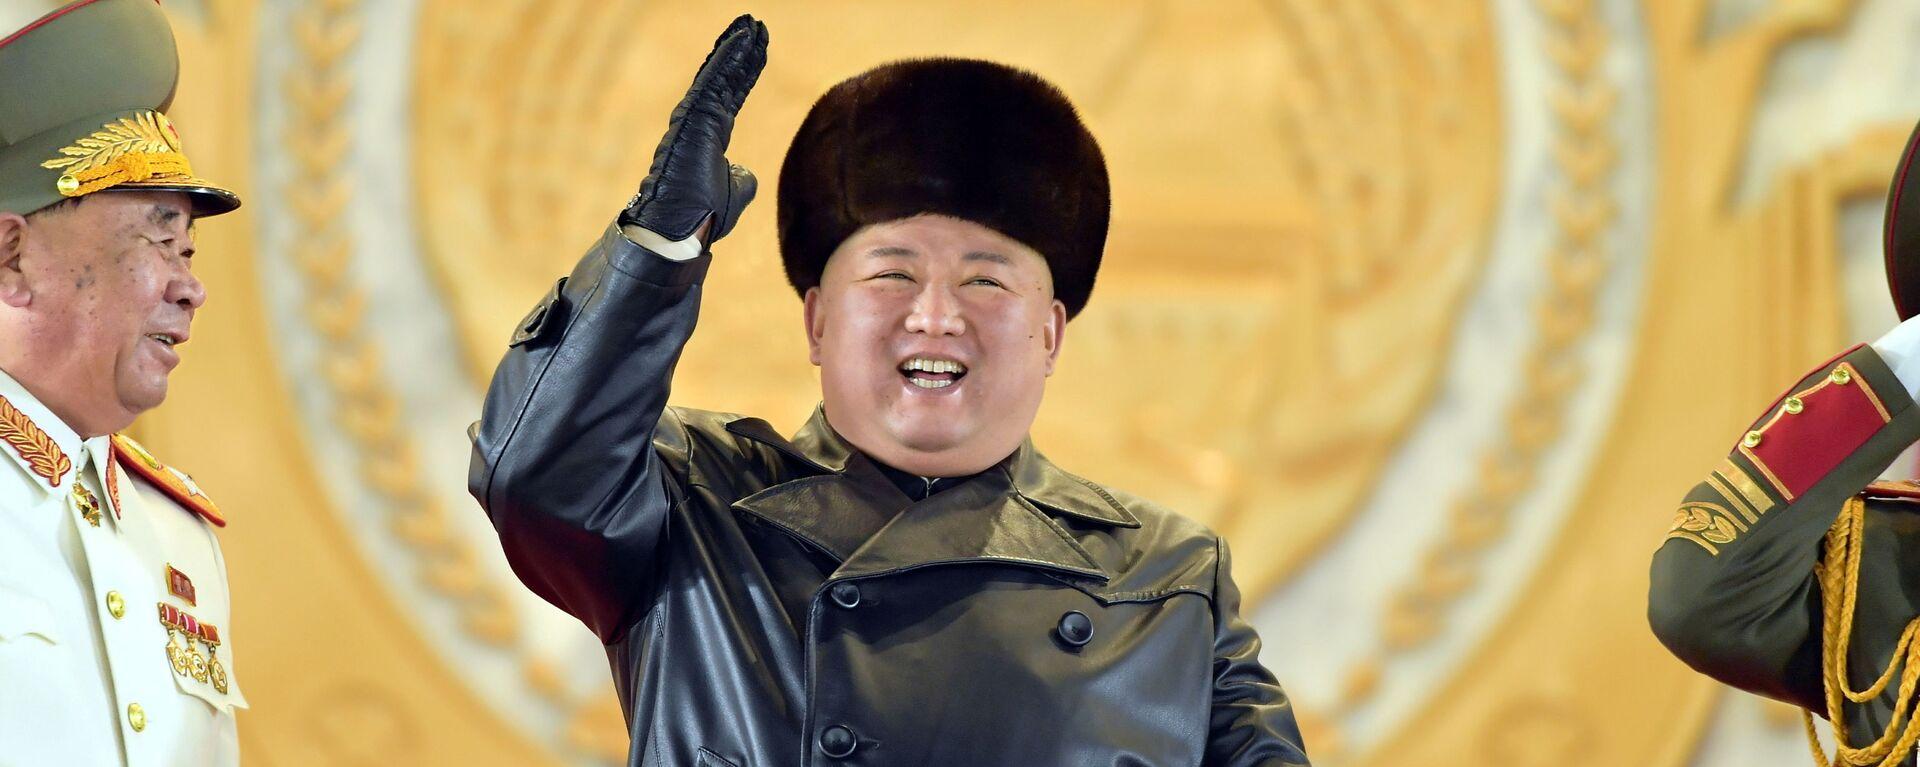 Kim Jong-un, líder de Corea del Norte - Sputnik Mundo, 1920, 20.01.2021